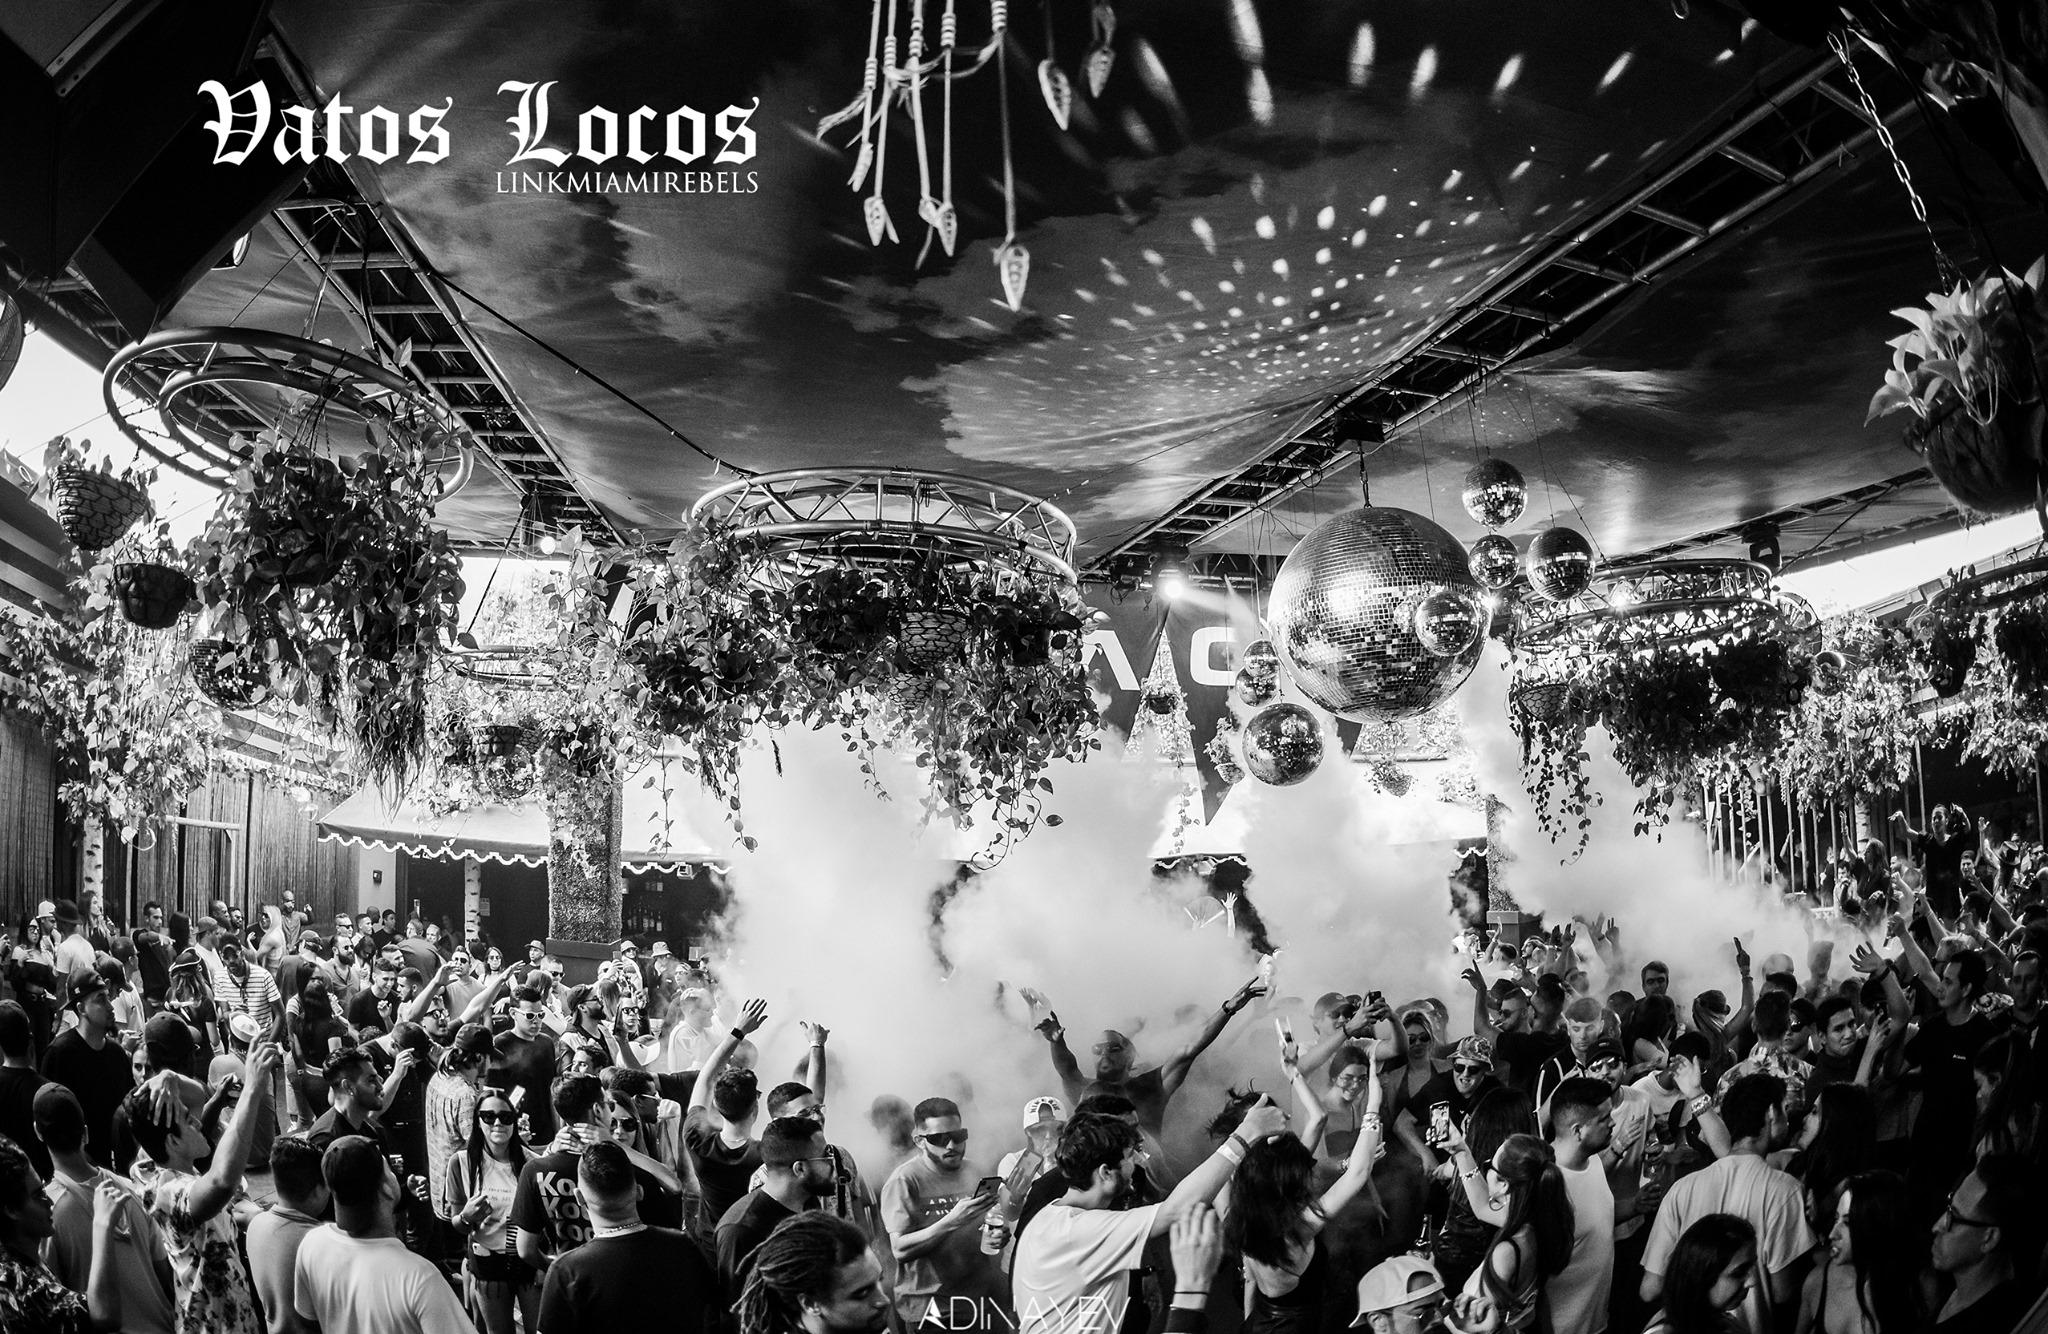 Vatos Locos / July 20